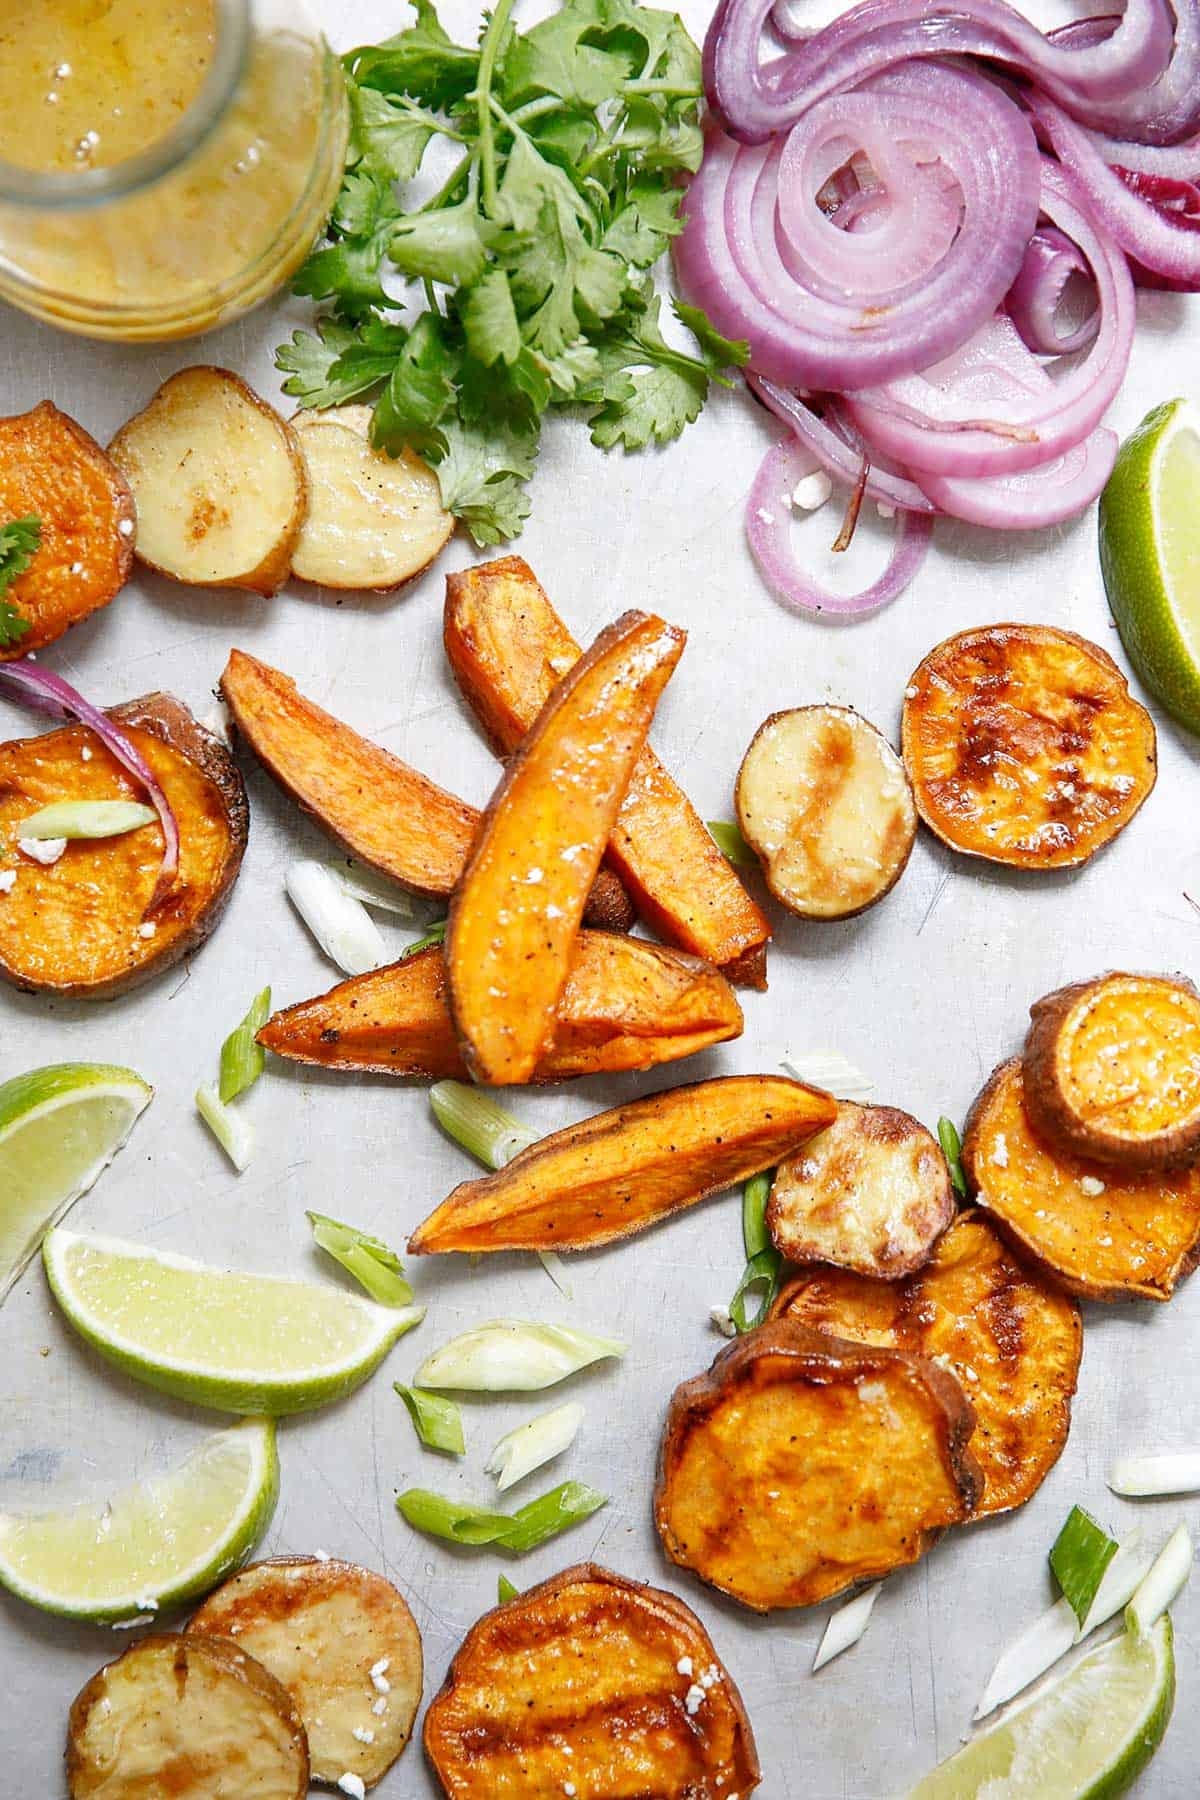 Grilled Sweet Potato Salad with Honey Mustard Vinaigrette (Vegetarian & Gluten-Free) - Lexi's Clean Kitchen